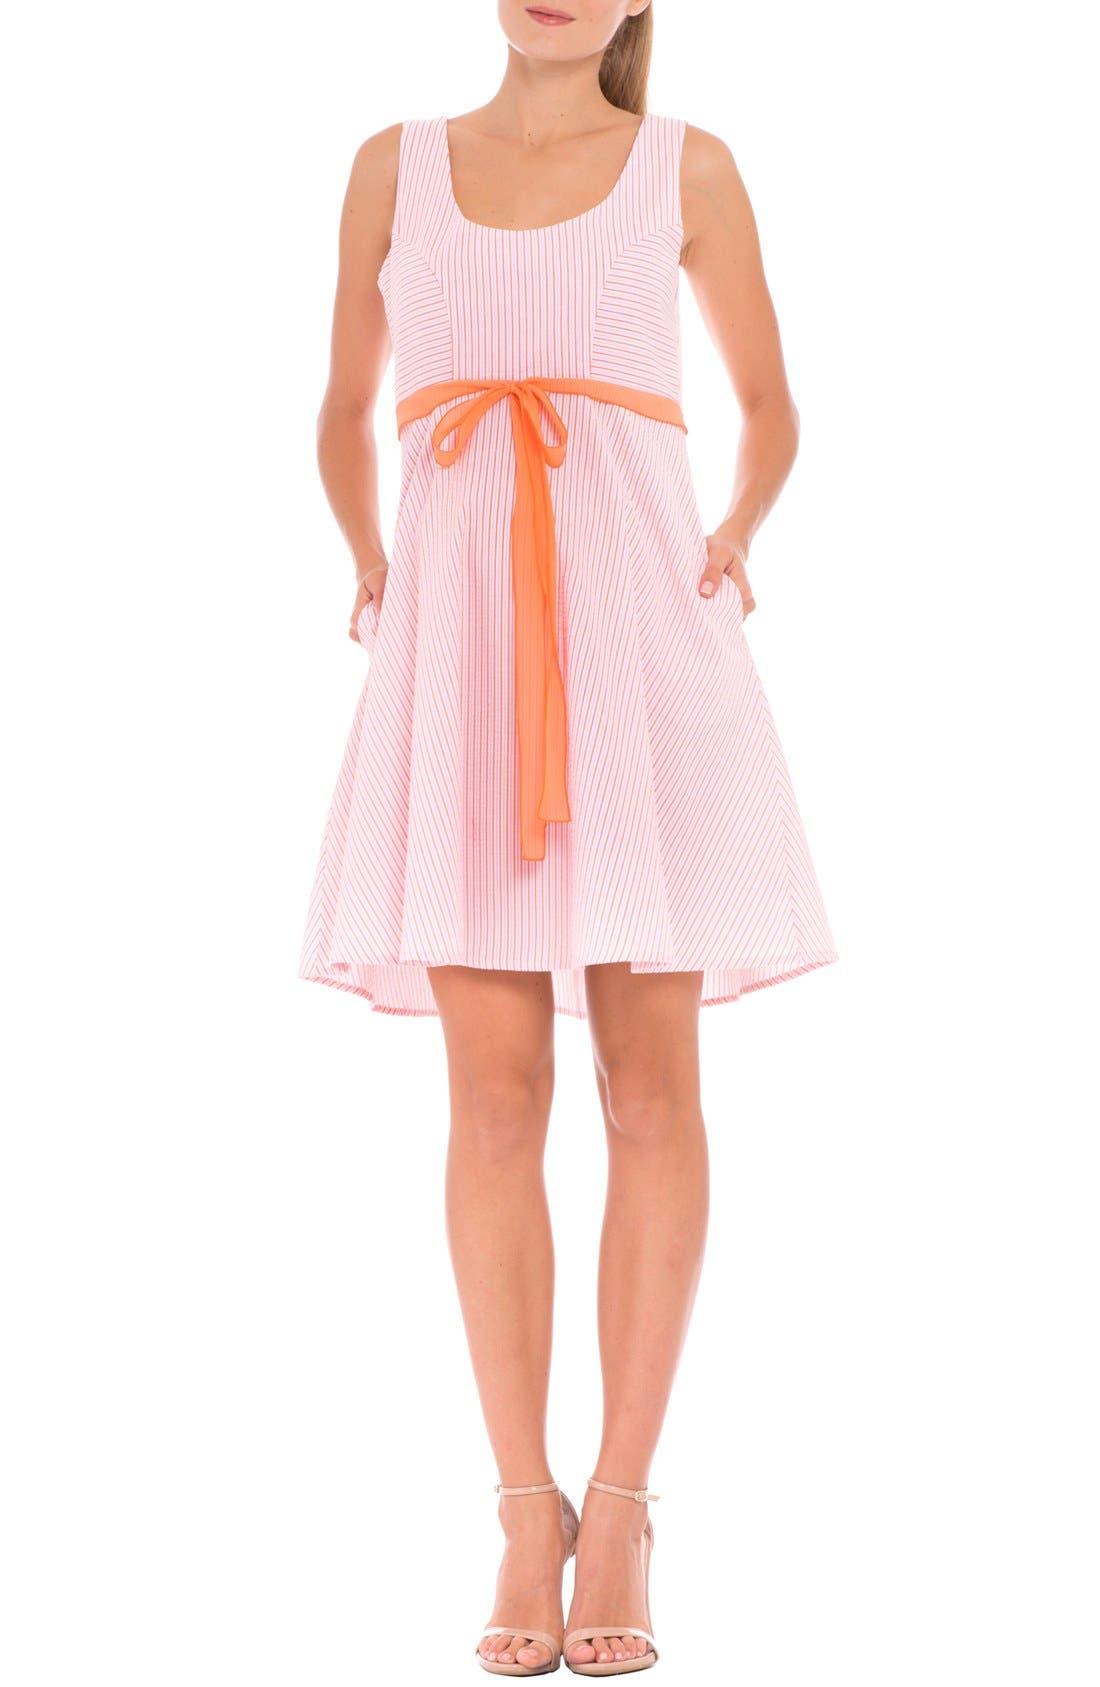 Olian 'Ava' Seersucker Maternity Dress